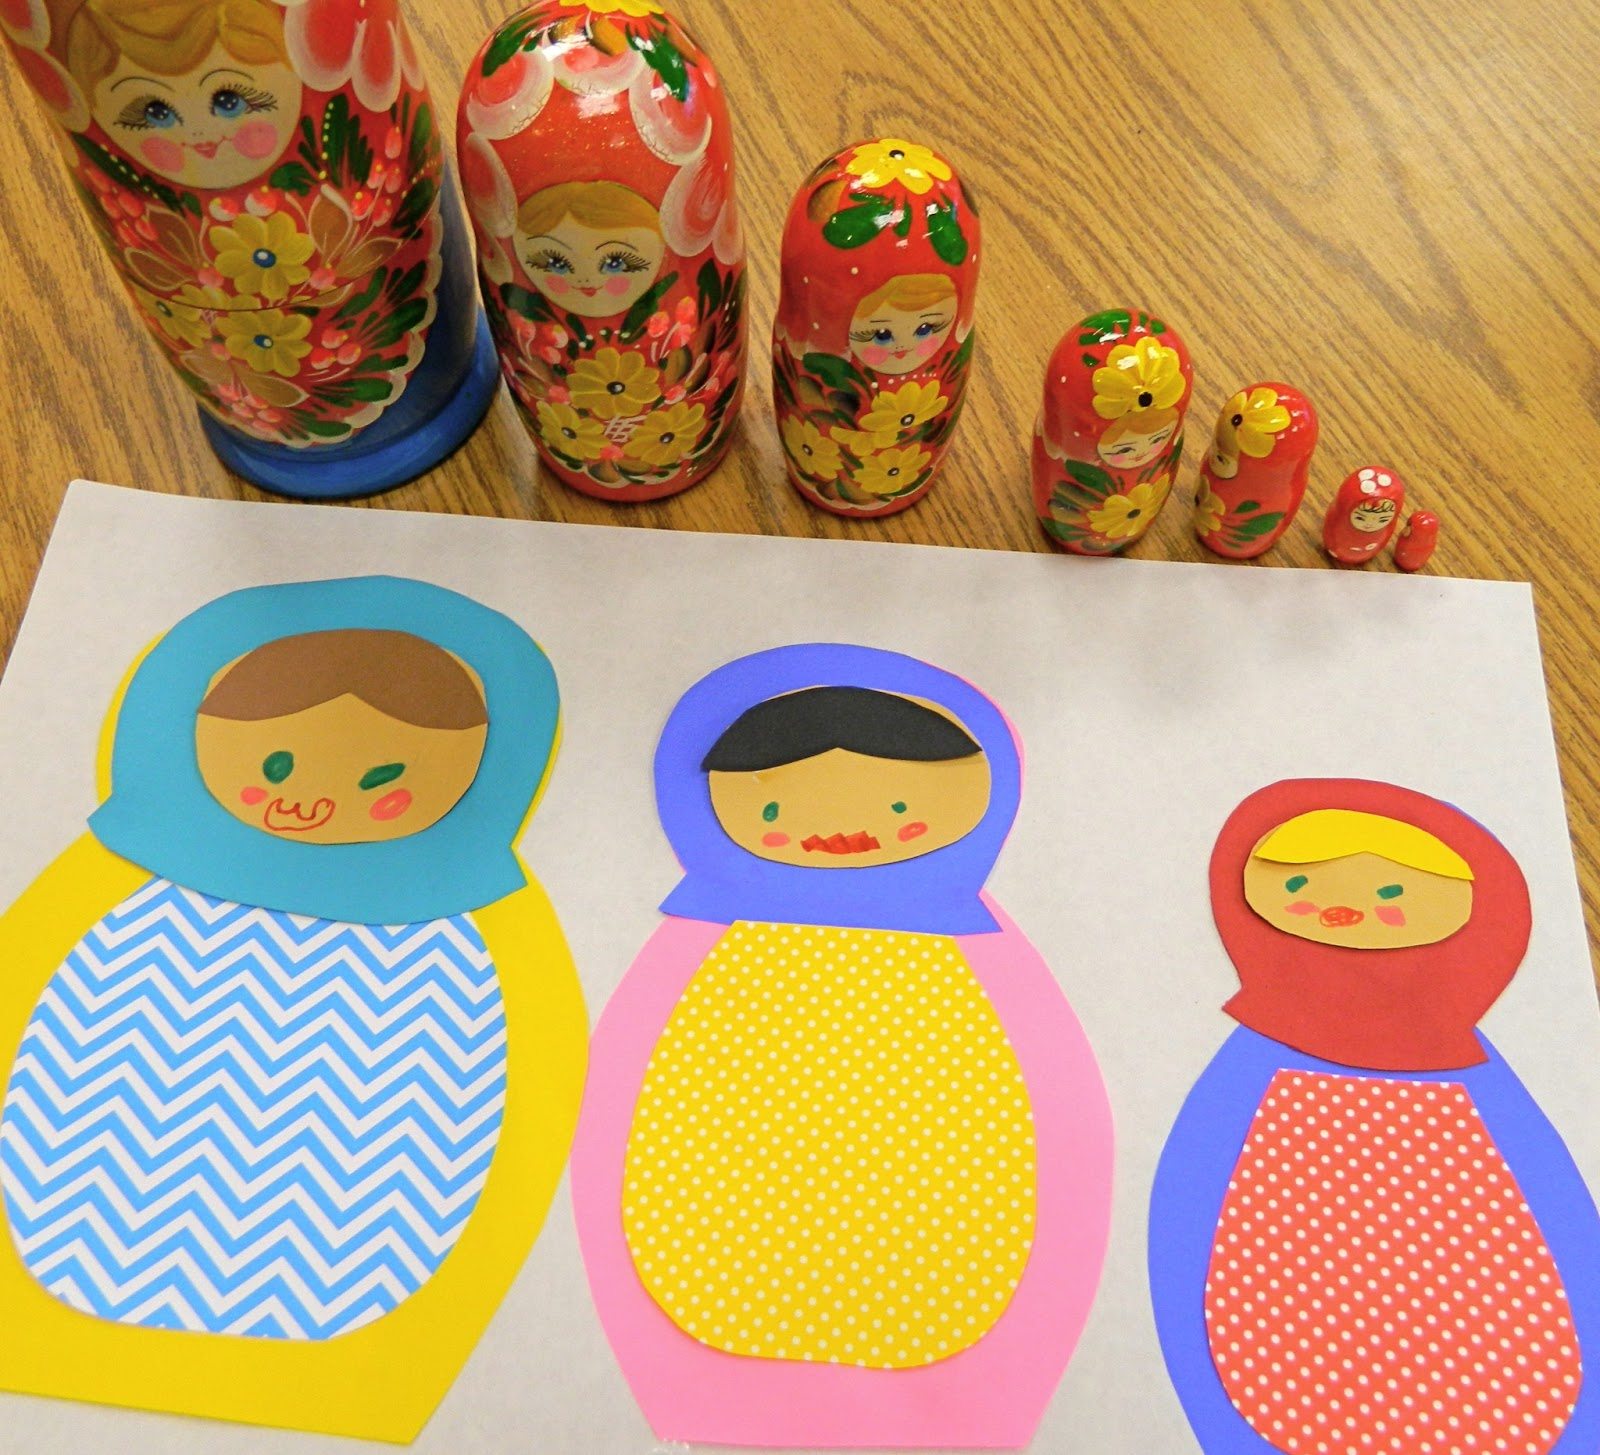 The Vintage Umbrella Nesting Doll Art Project